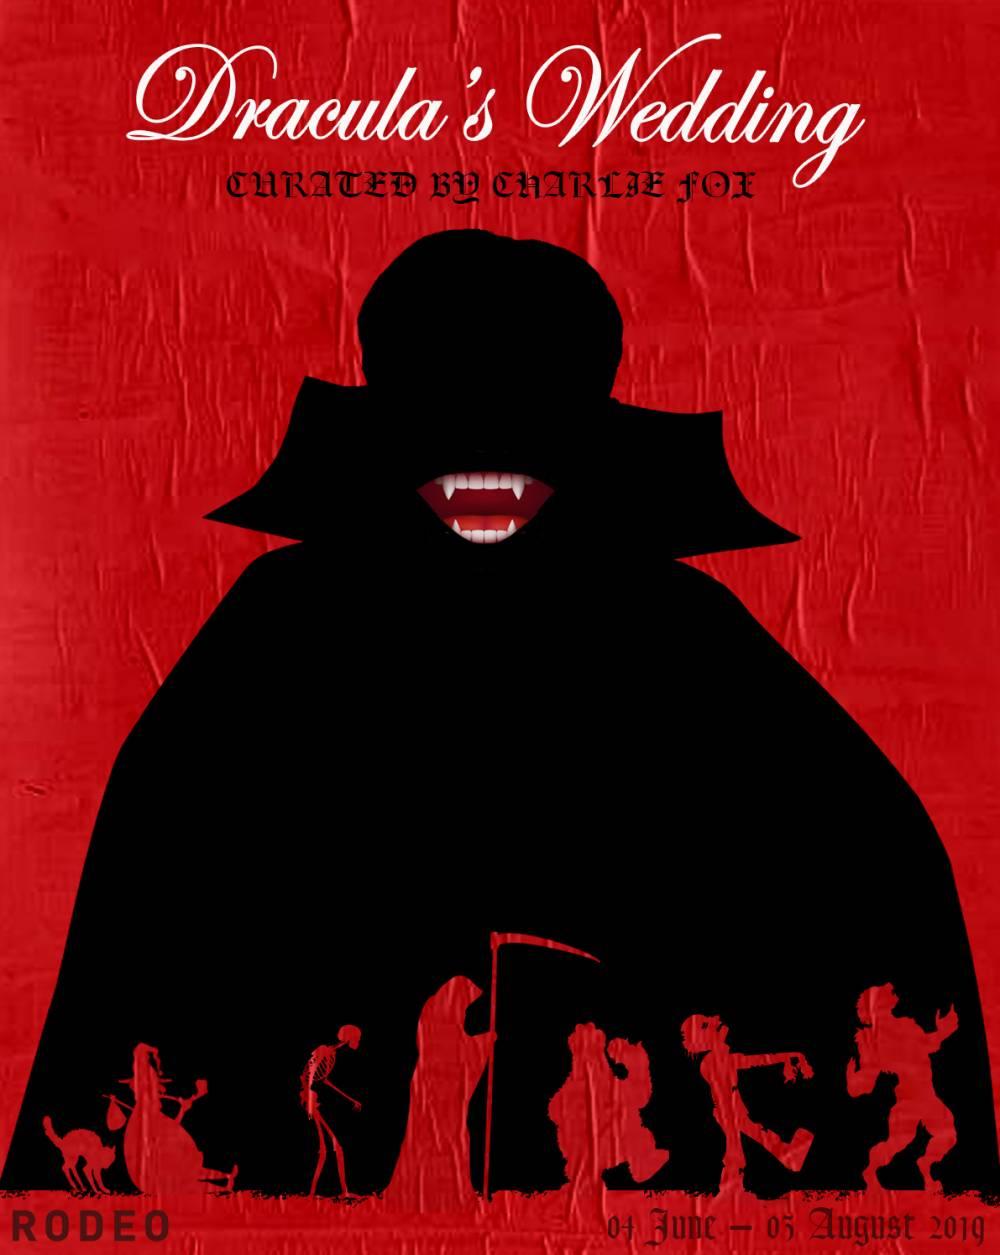 Dracula's Wedding